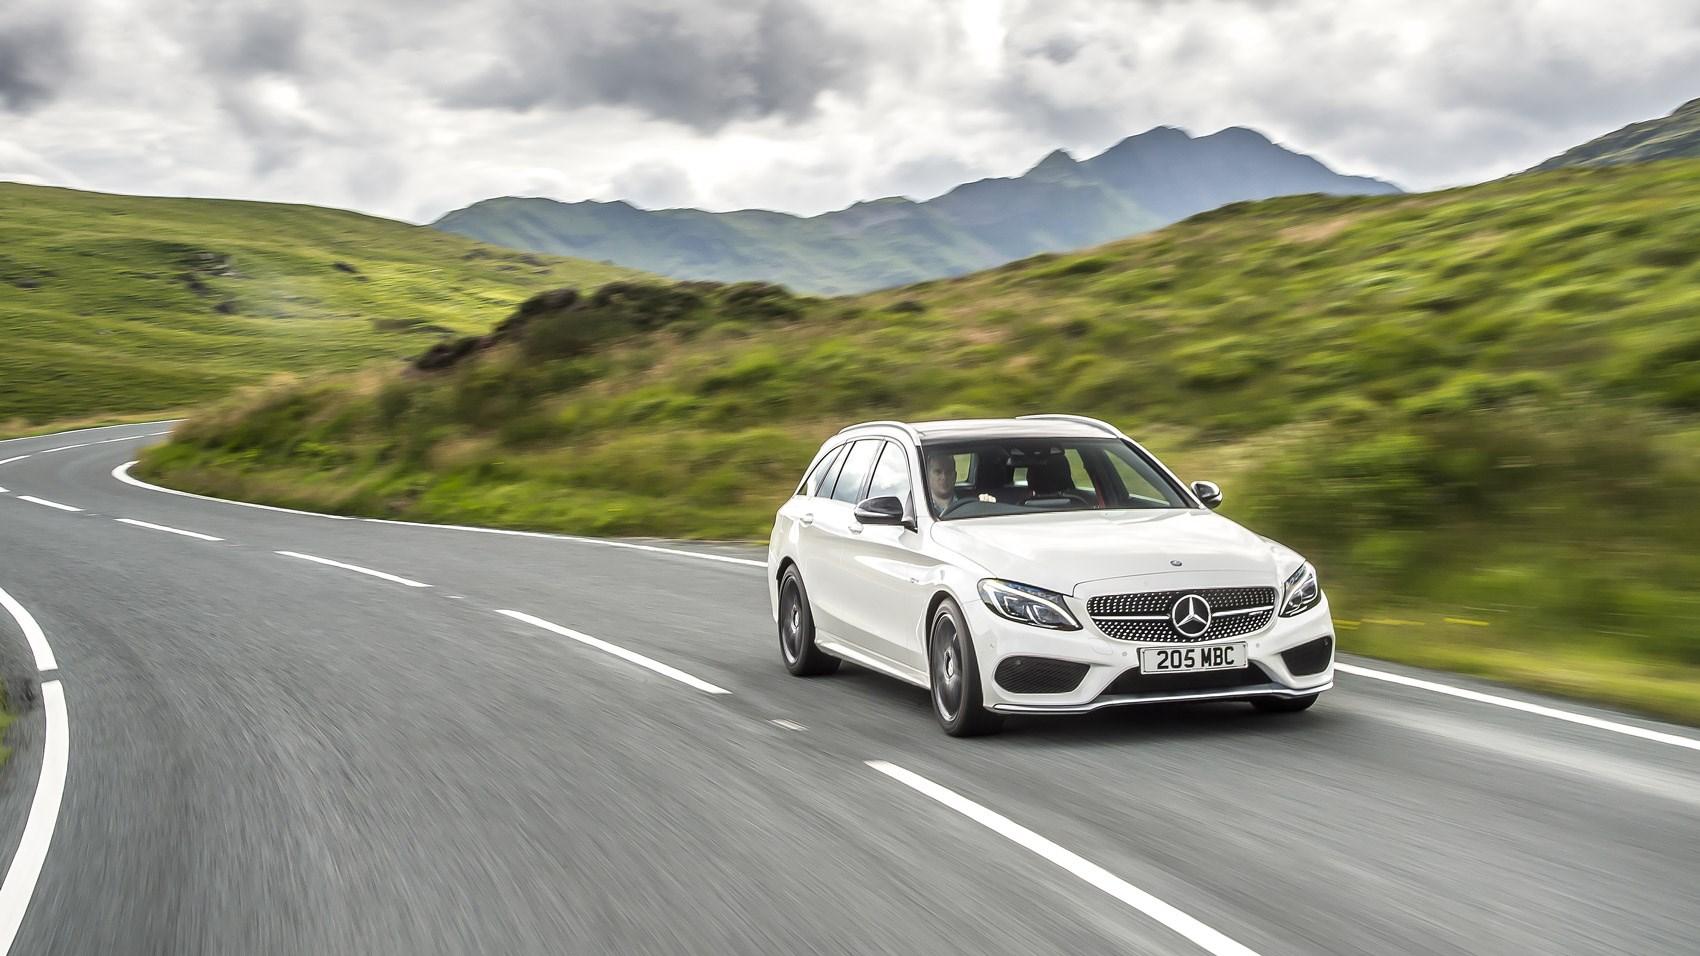 Mercedes Benz Lease Deals 0 Down >> Mercedes-AMG C43 4Matic Estate (2016) review by CAR Magazine